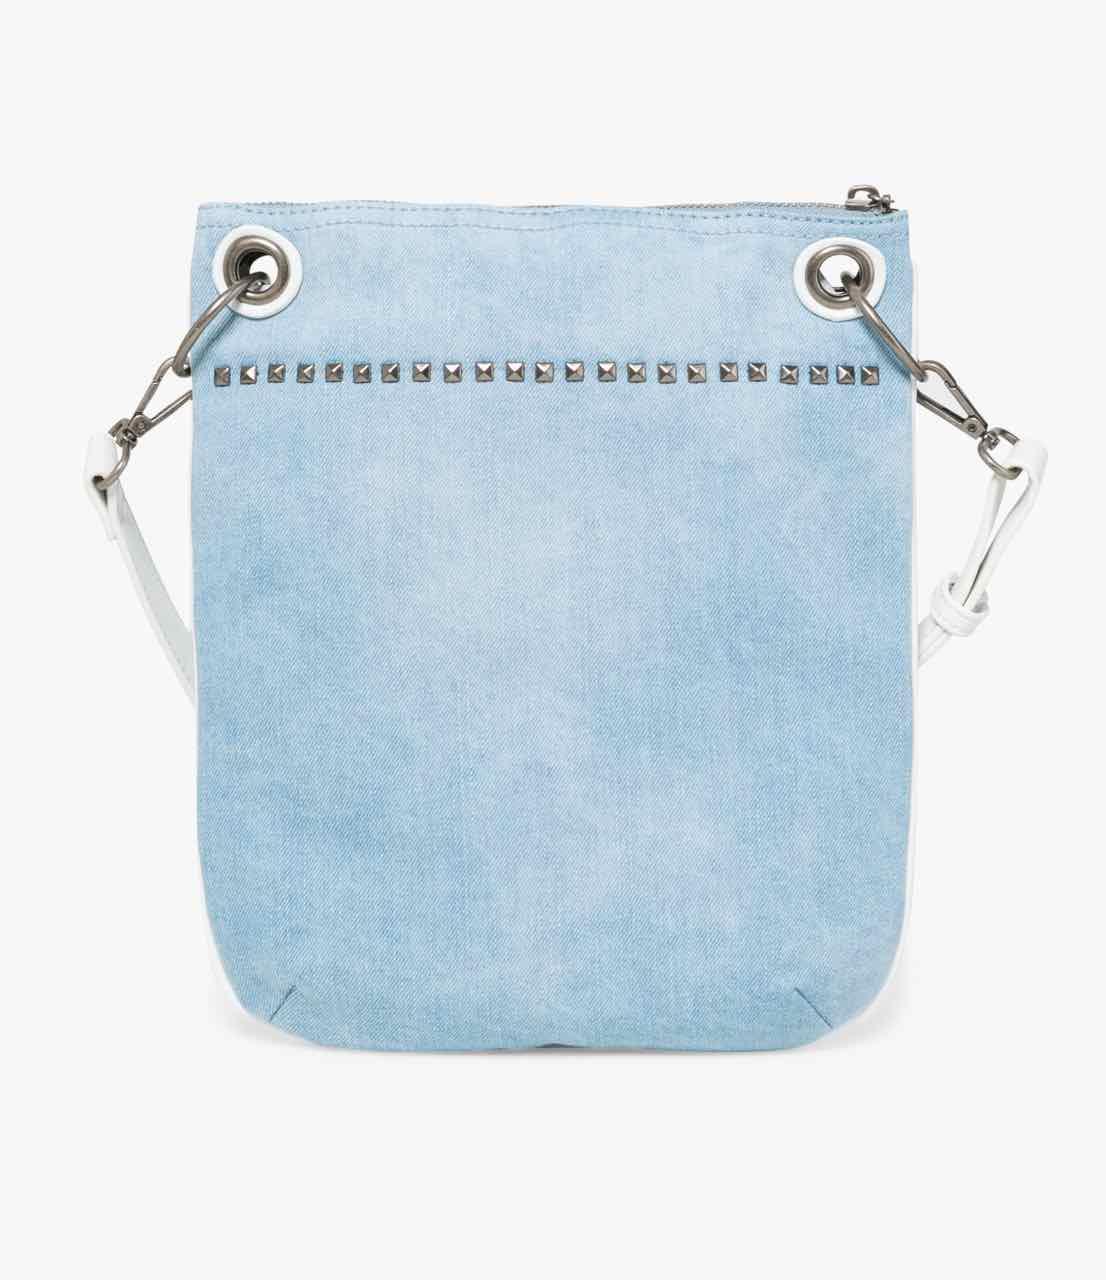 74X9JN6_5002 Desigual Bag Bandolera Whitney Canada